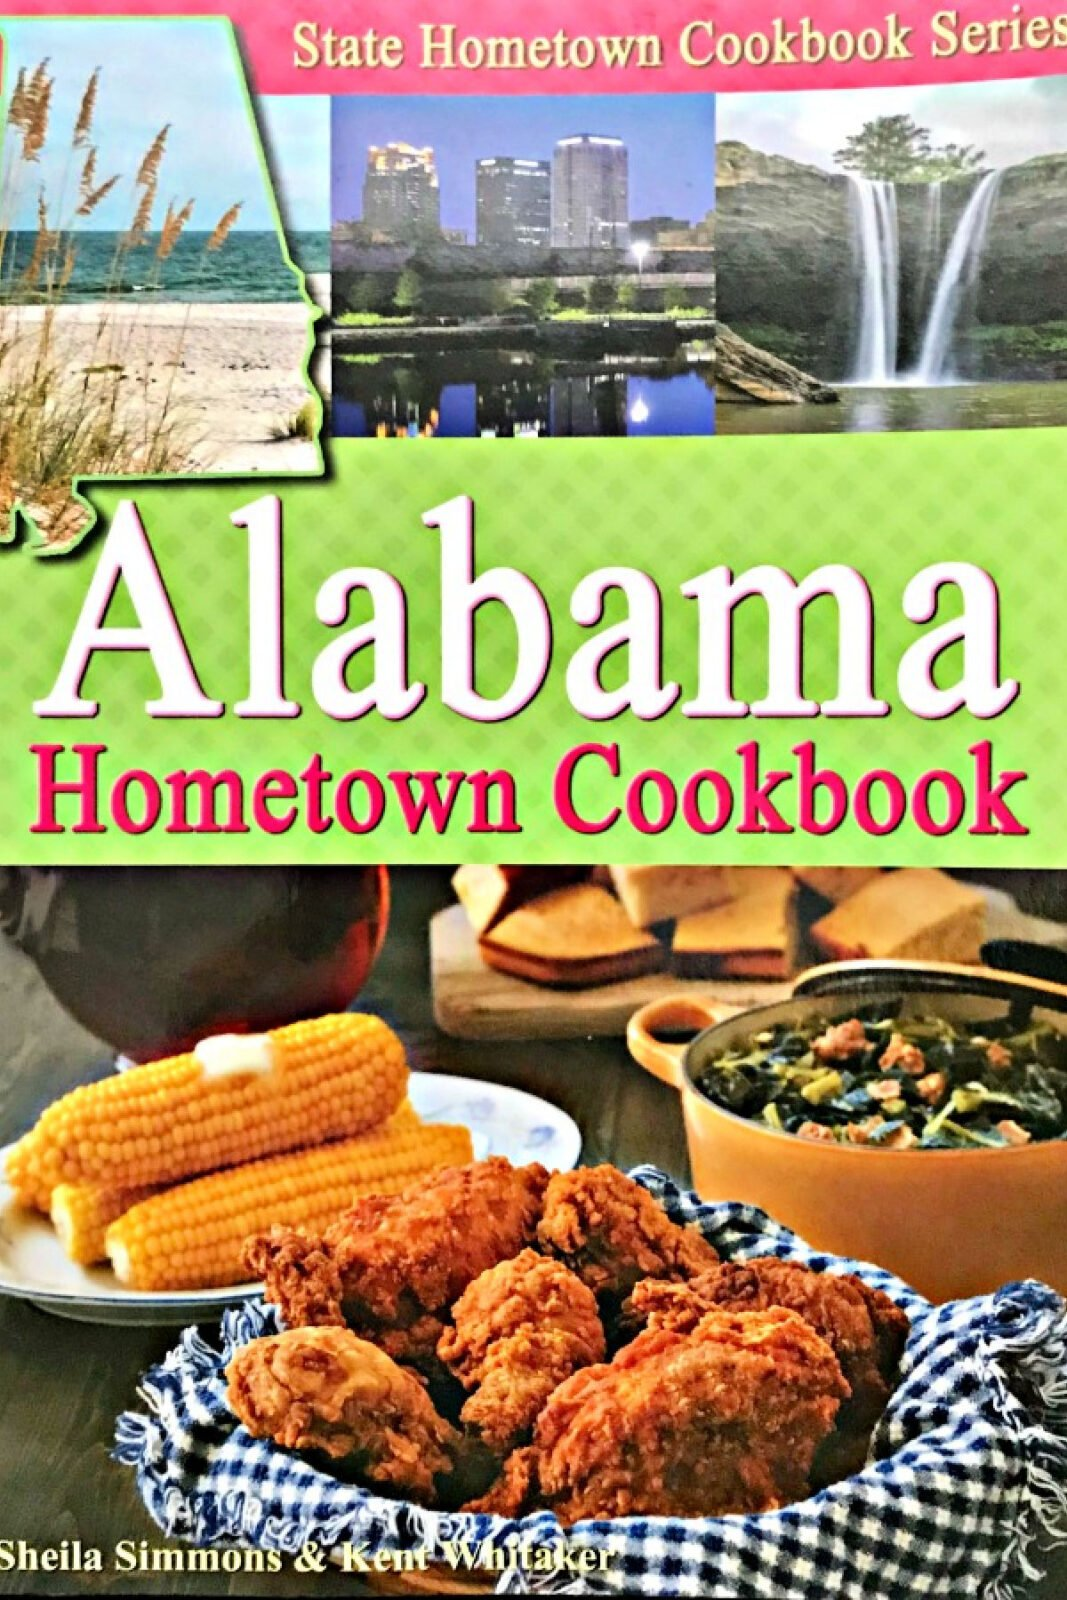 Alabama Hometown Cookbook cover.